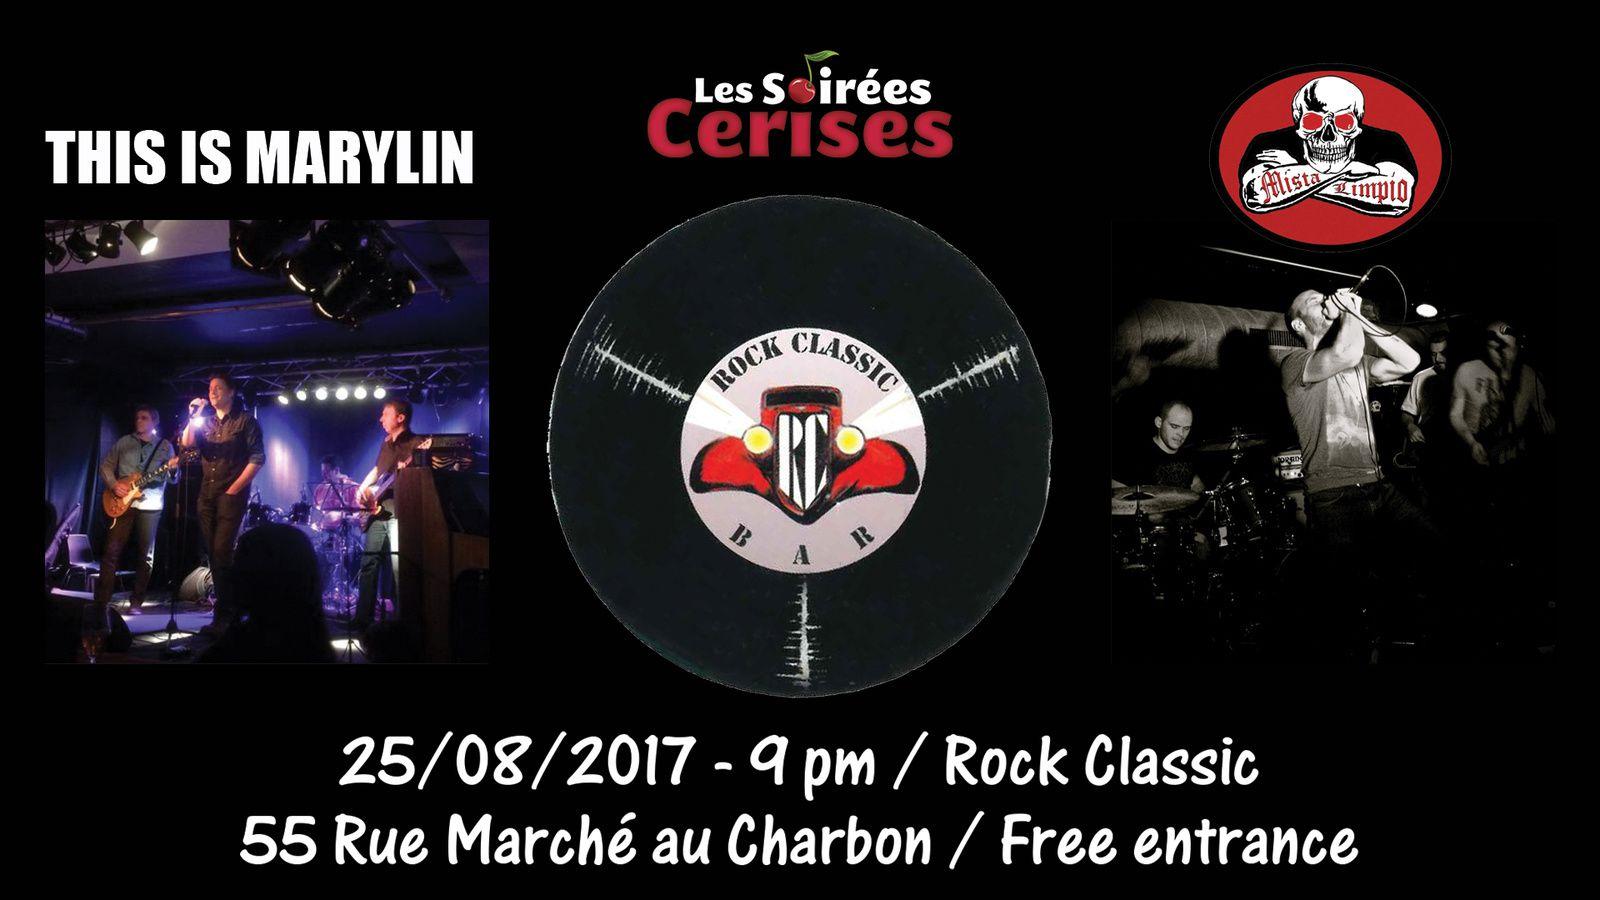 ▶ This is Marylyn + Mista Limpio @ Rock Classic - 25/08/2017 - 21h00 - Entrée gratuite !